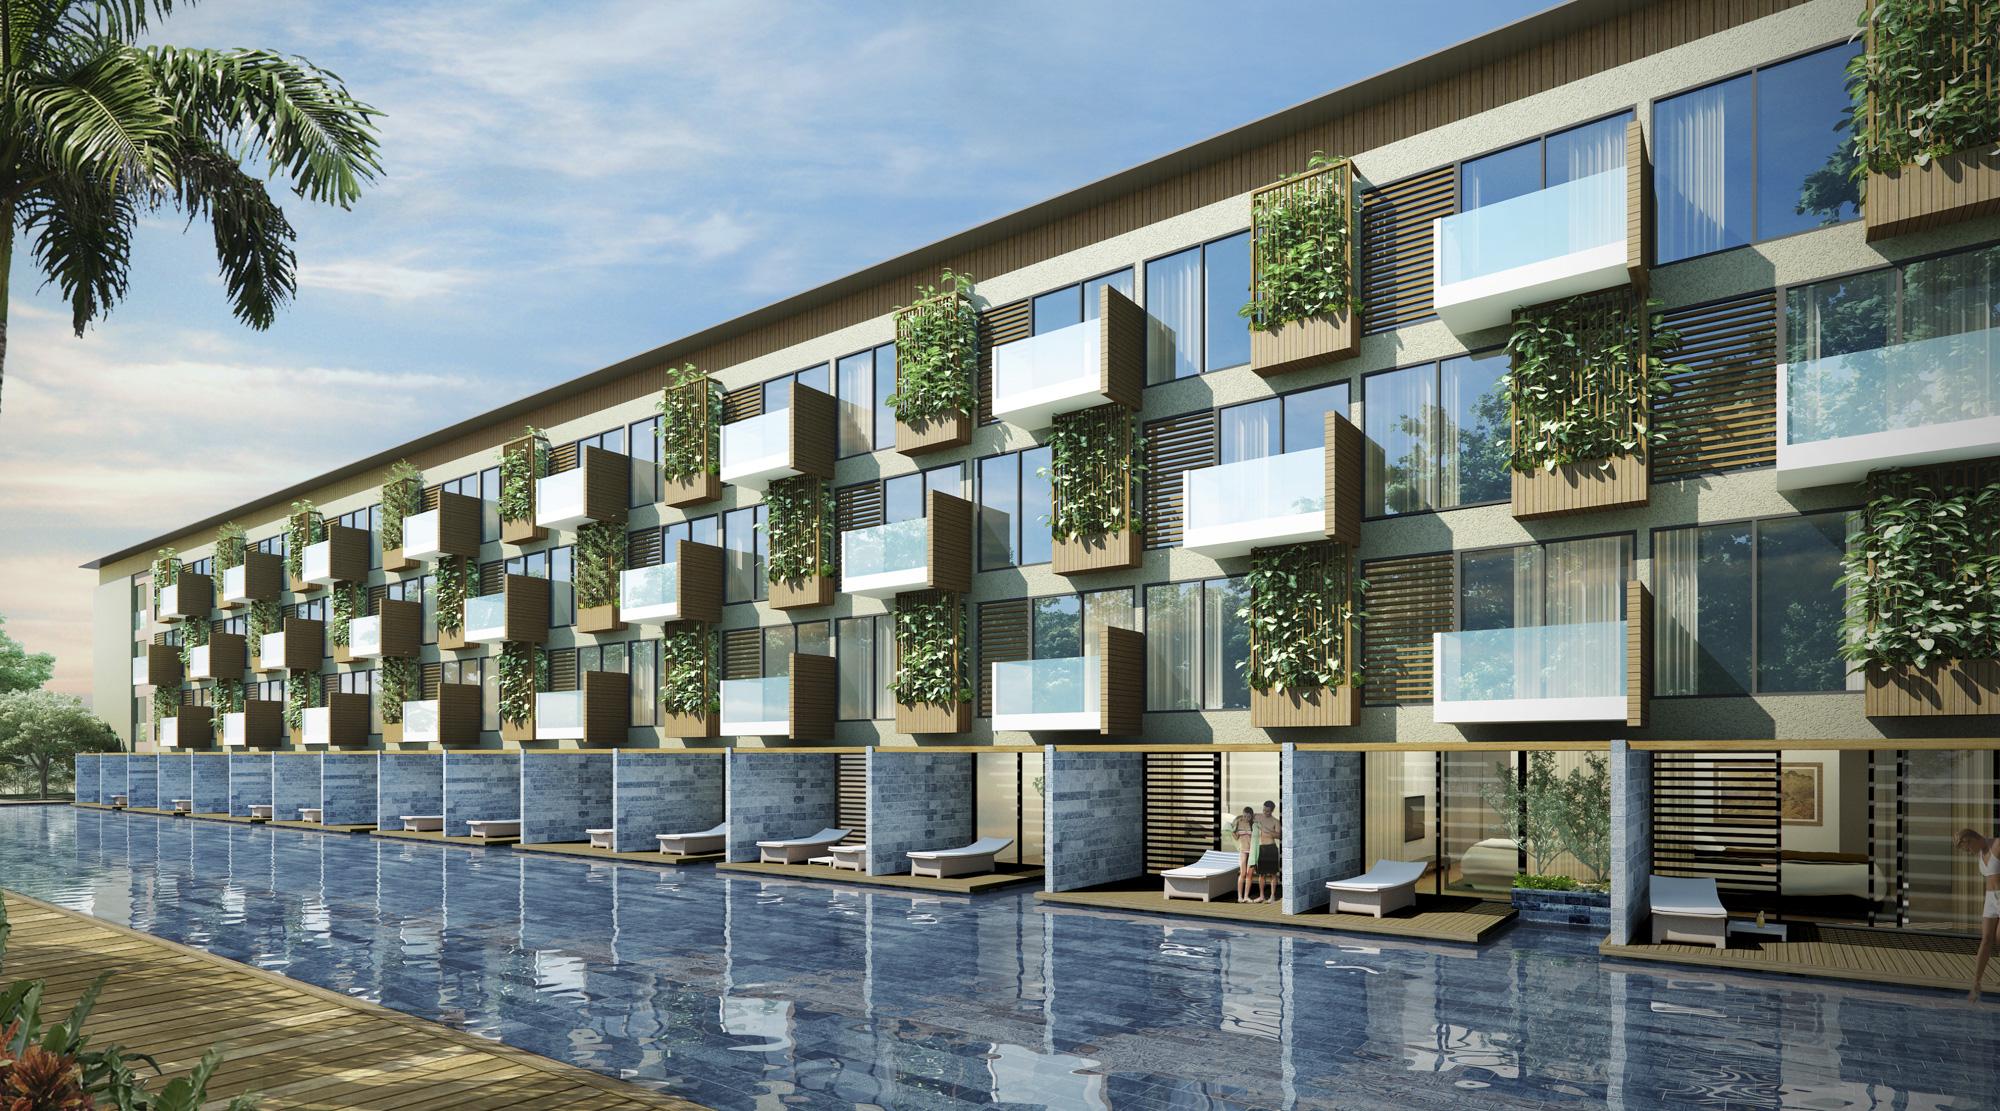 Song Hau Resort Exterior 4